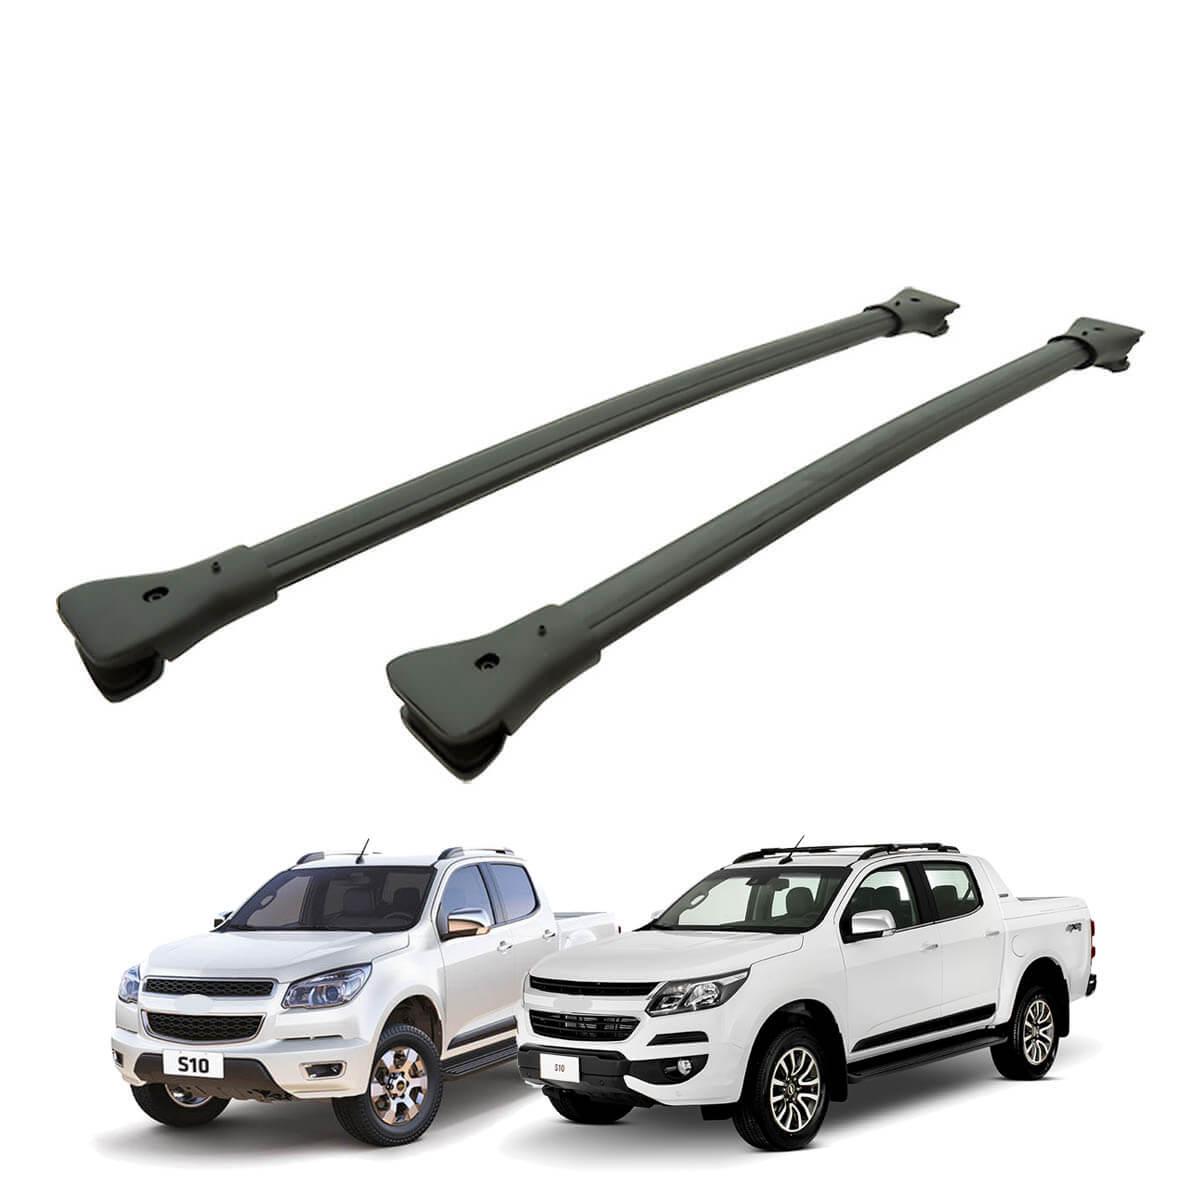 Travessa rack de teto larga preta alumínio Nova S10 cabine dupla 2012 a 2018